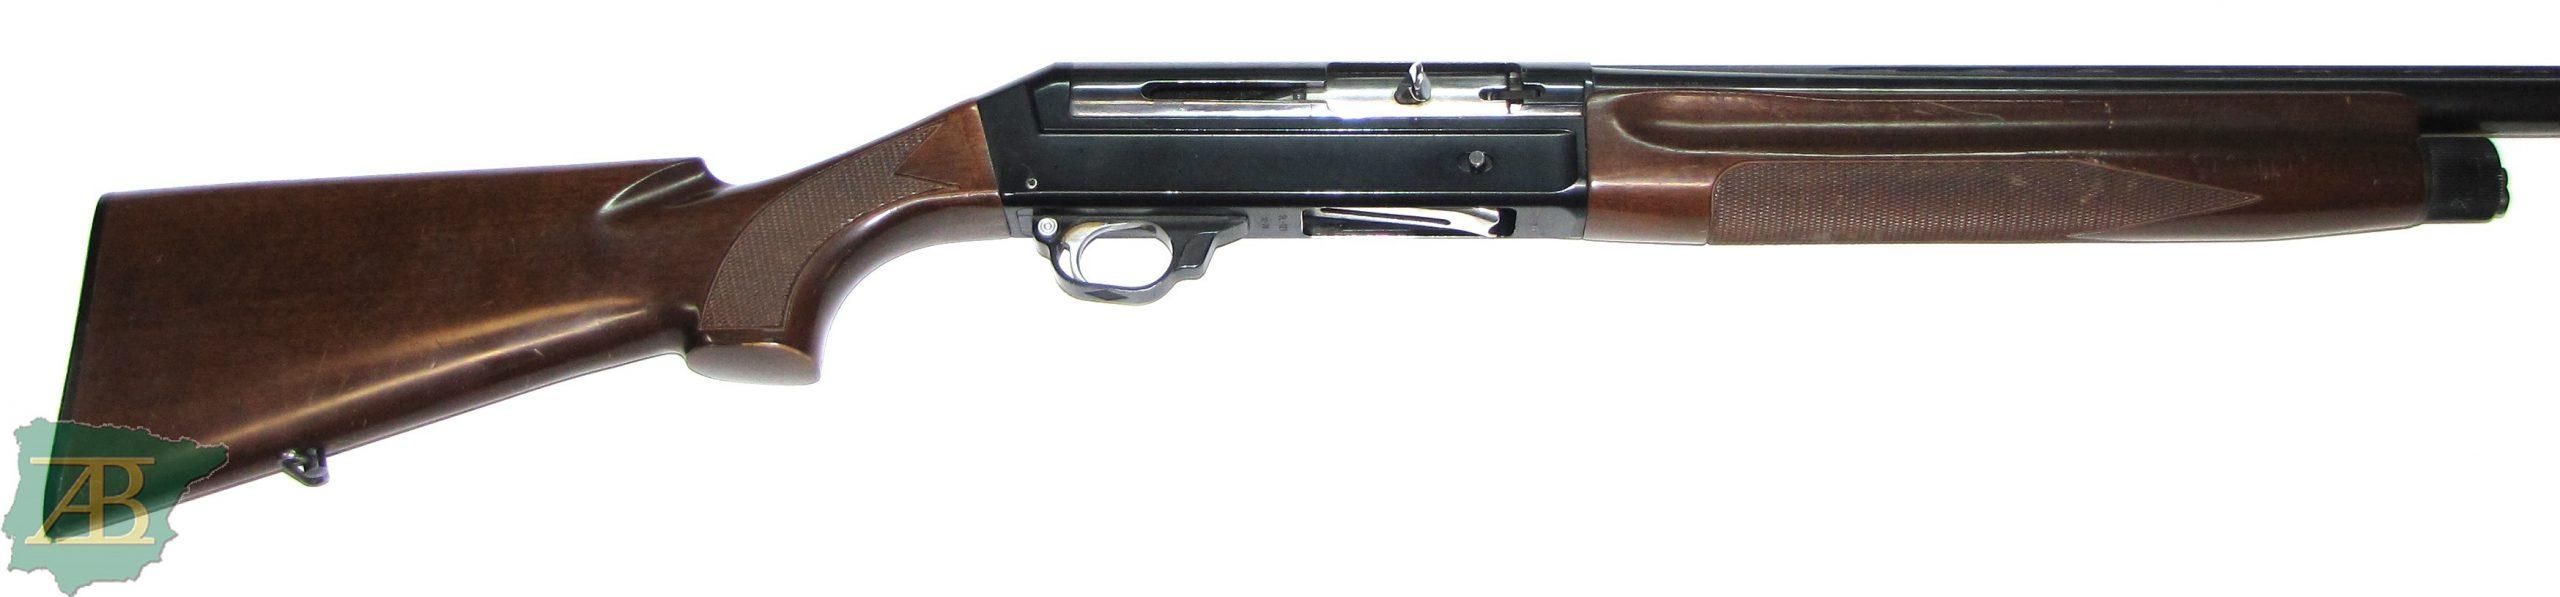 Escopeta semiautomática de caza BENELLI SL121 Ref 5584-armeriaiberica-2